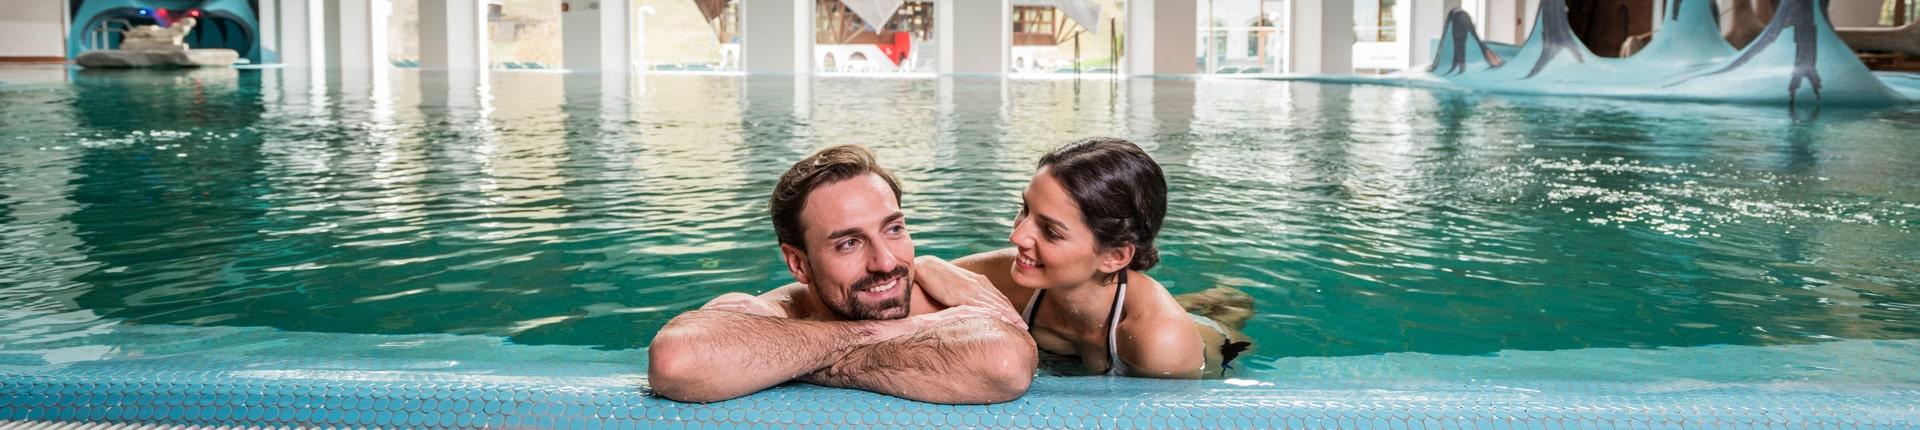 Thermalbad Pool im Bad Kleinkirchheim